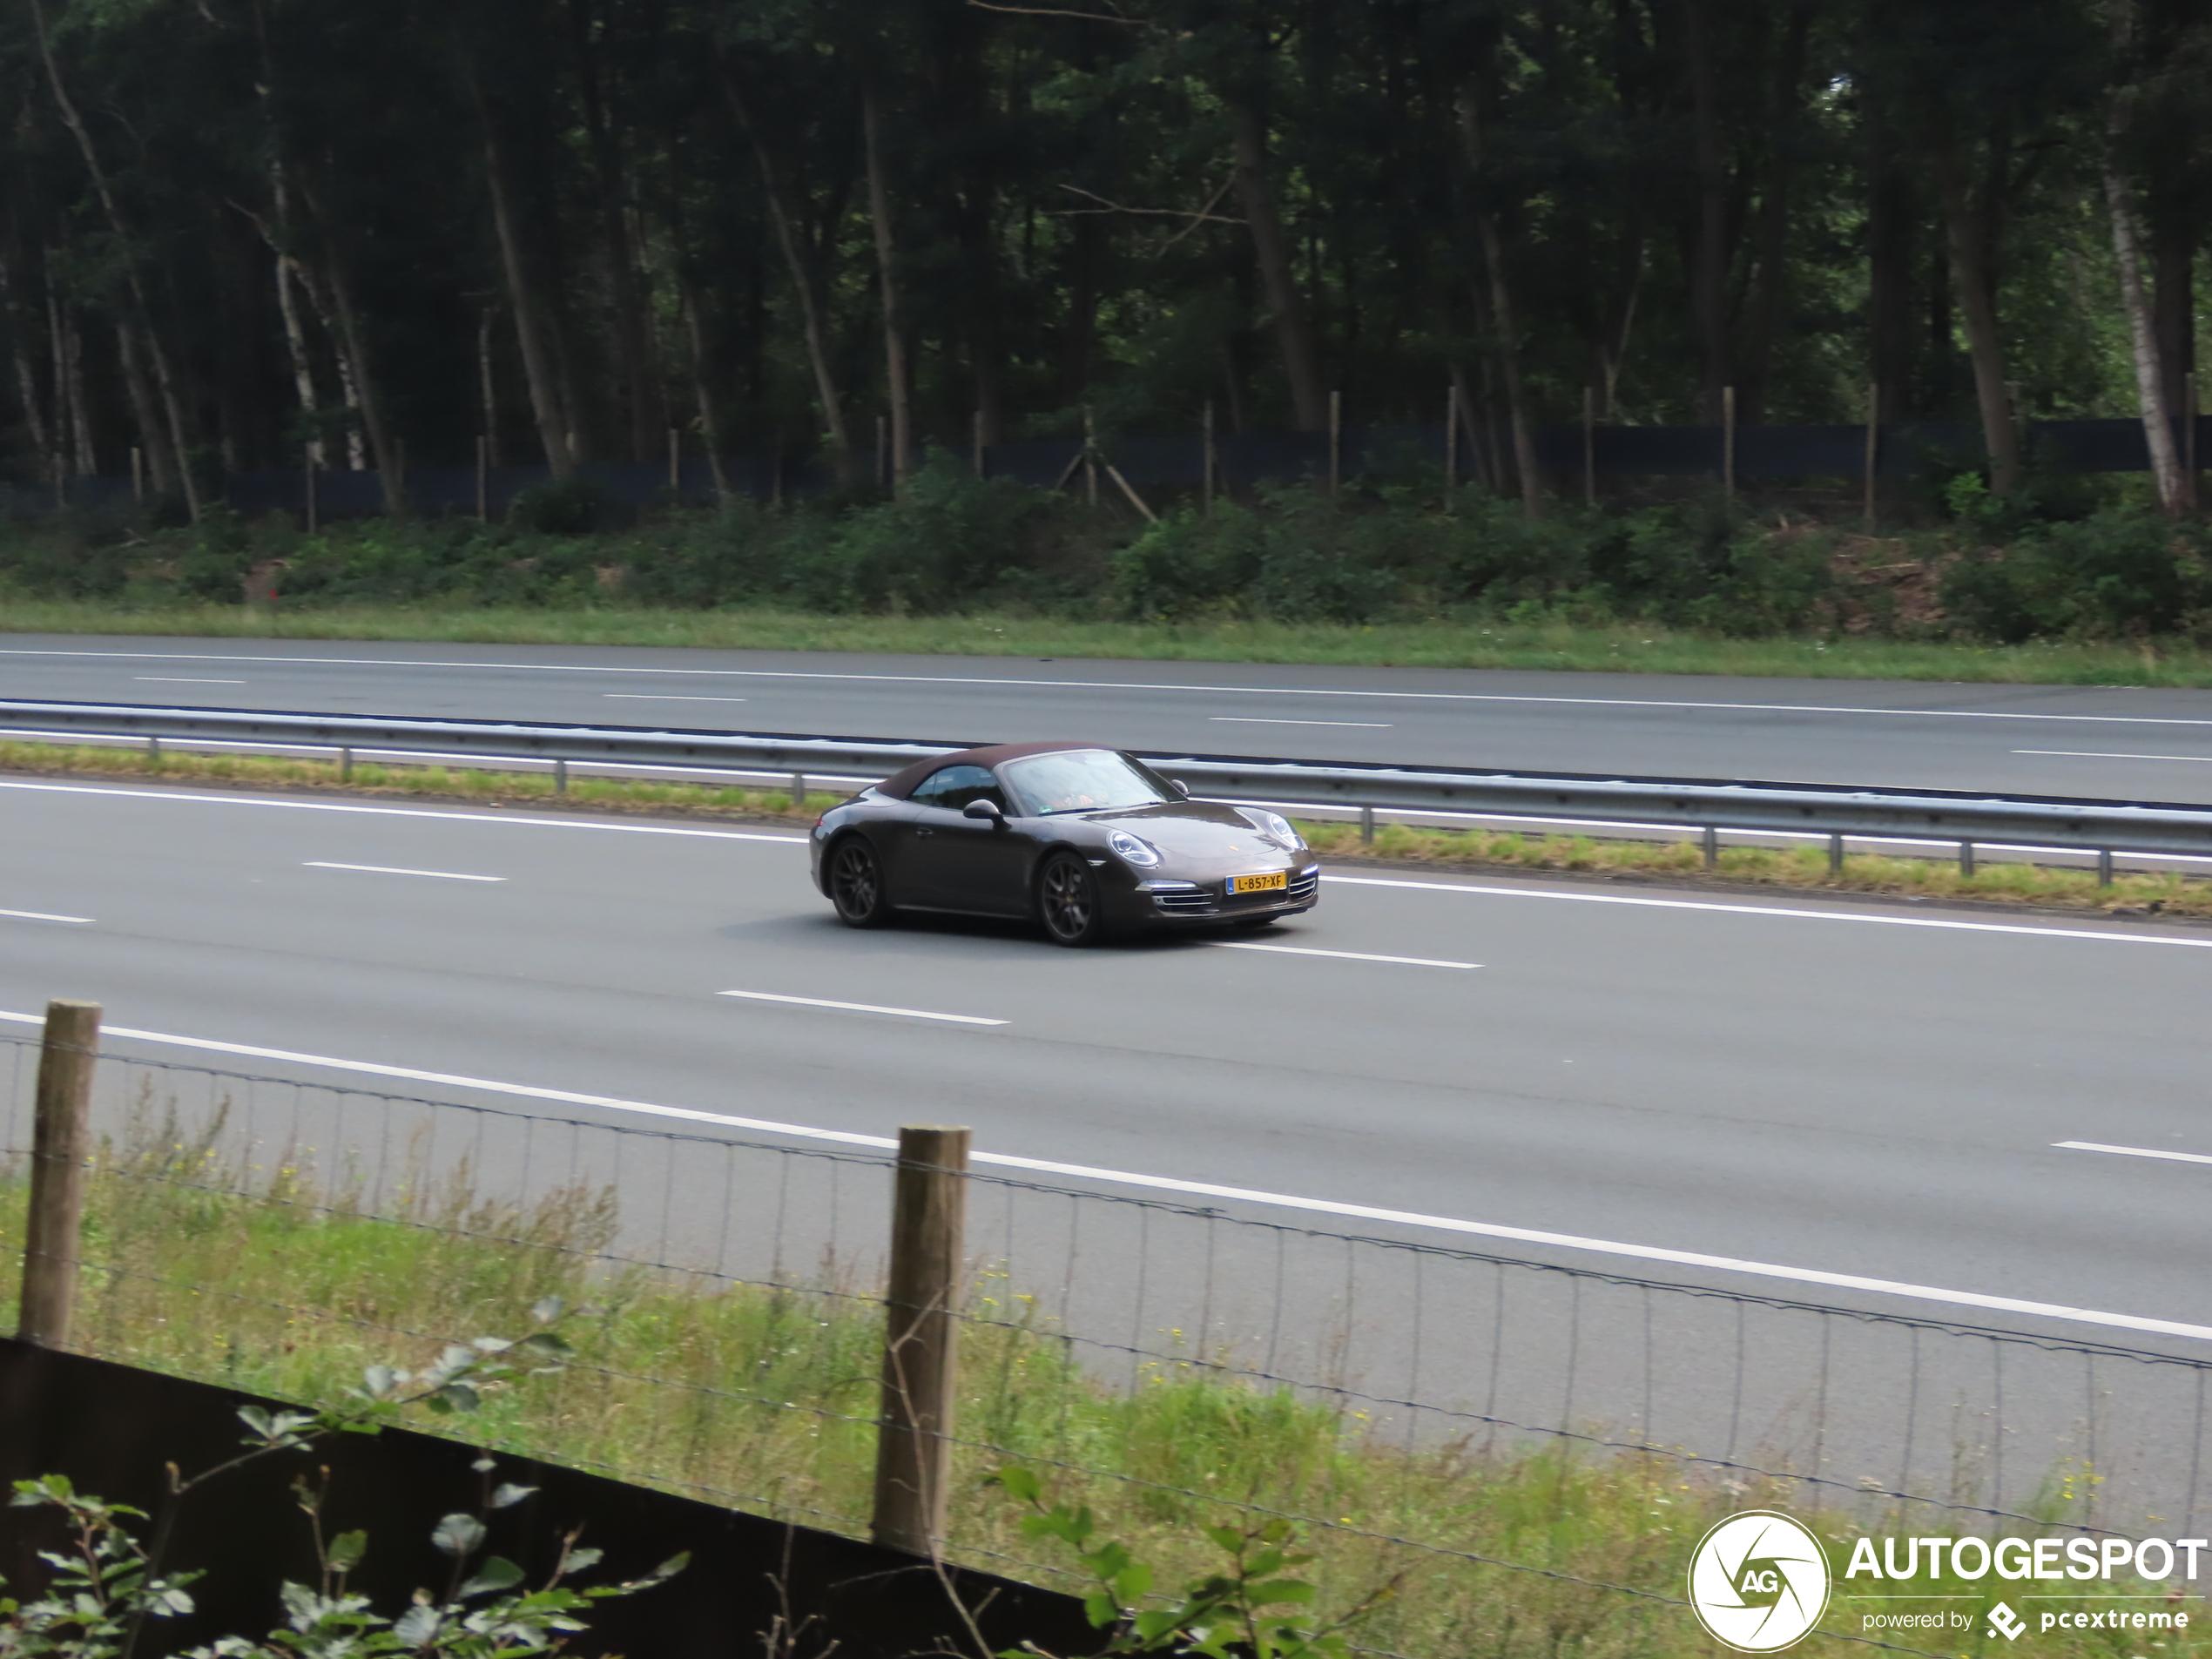 Porsche 991 Carrera 4S Cabriolet